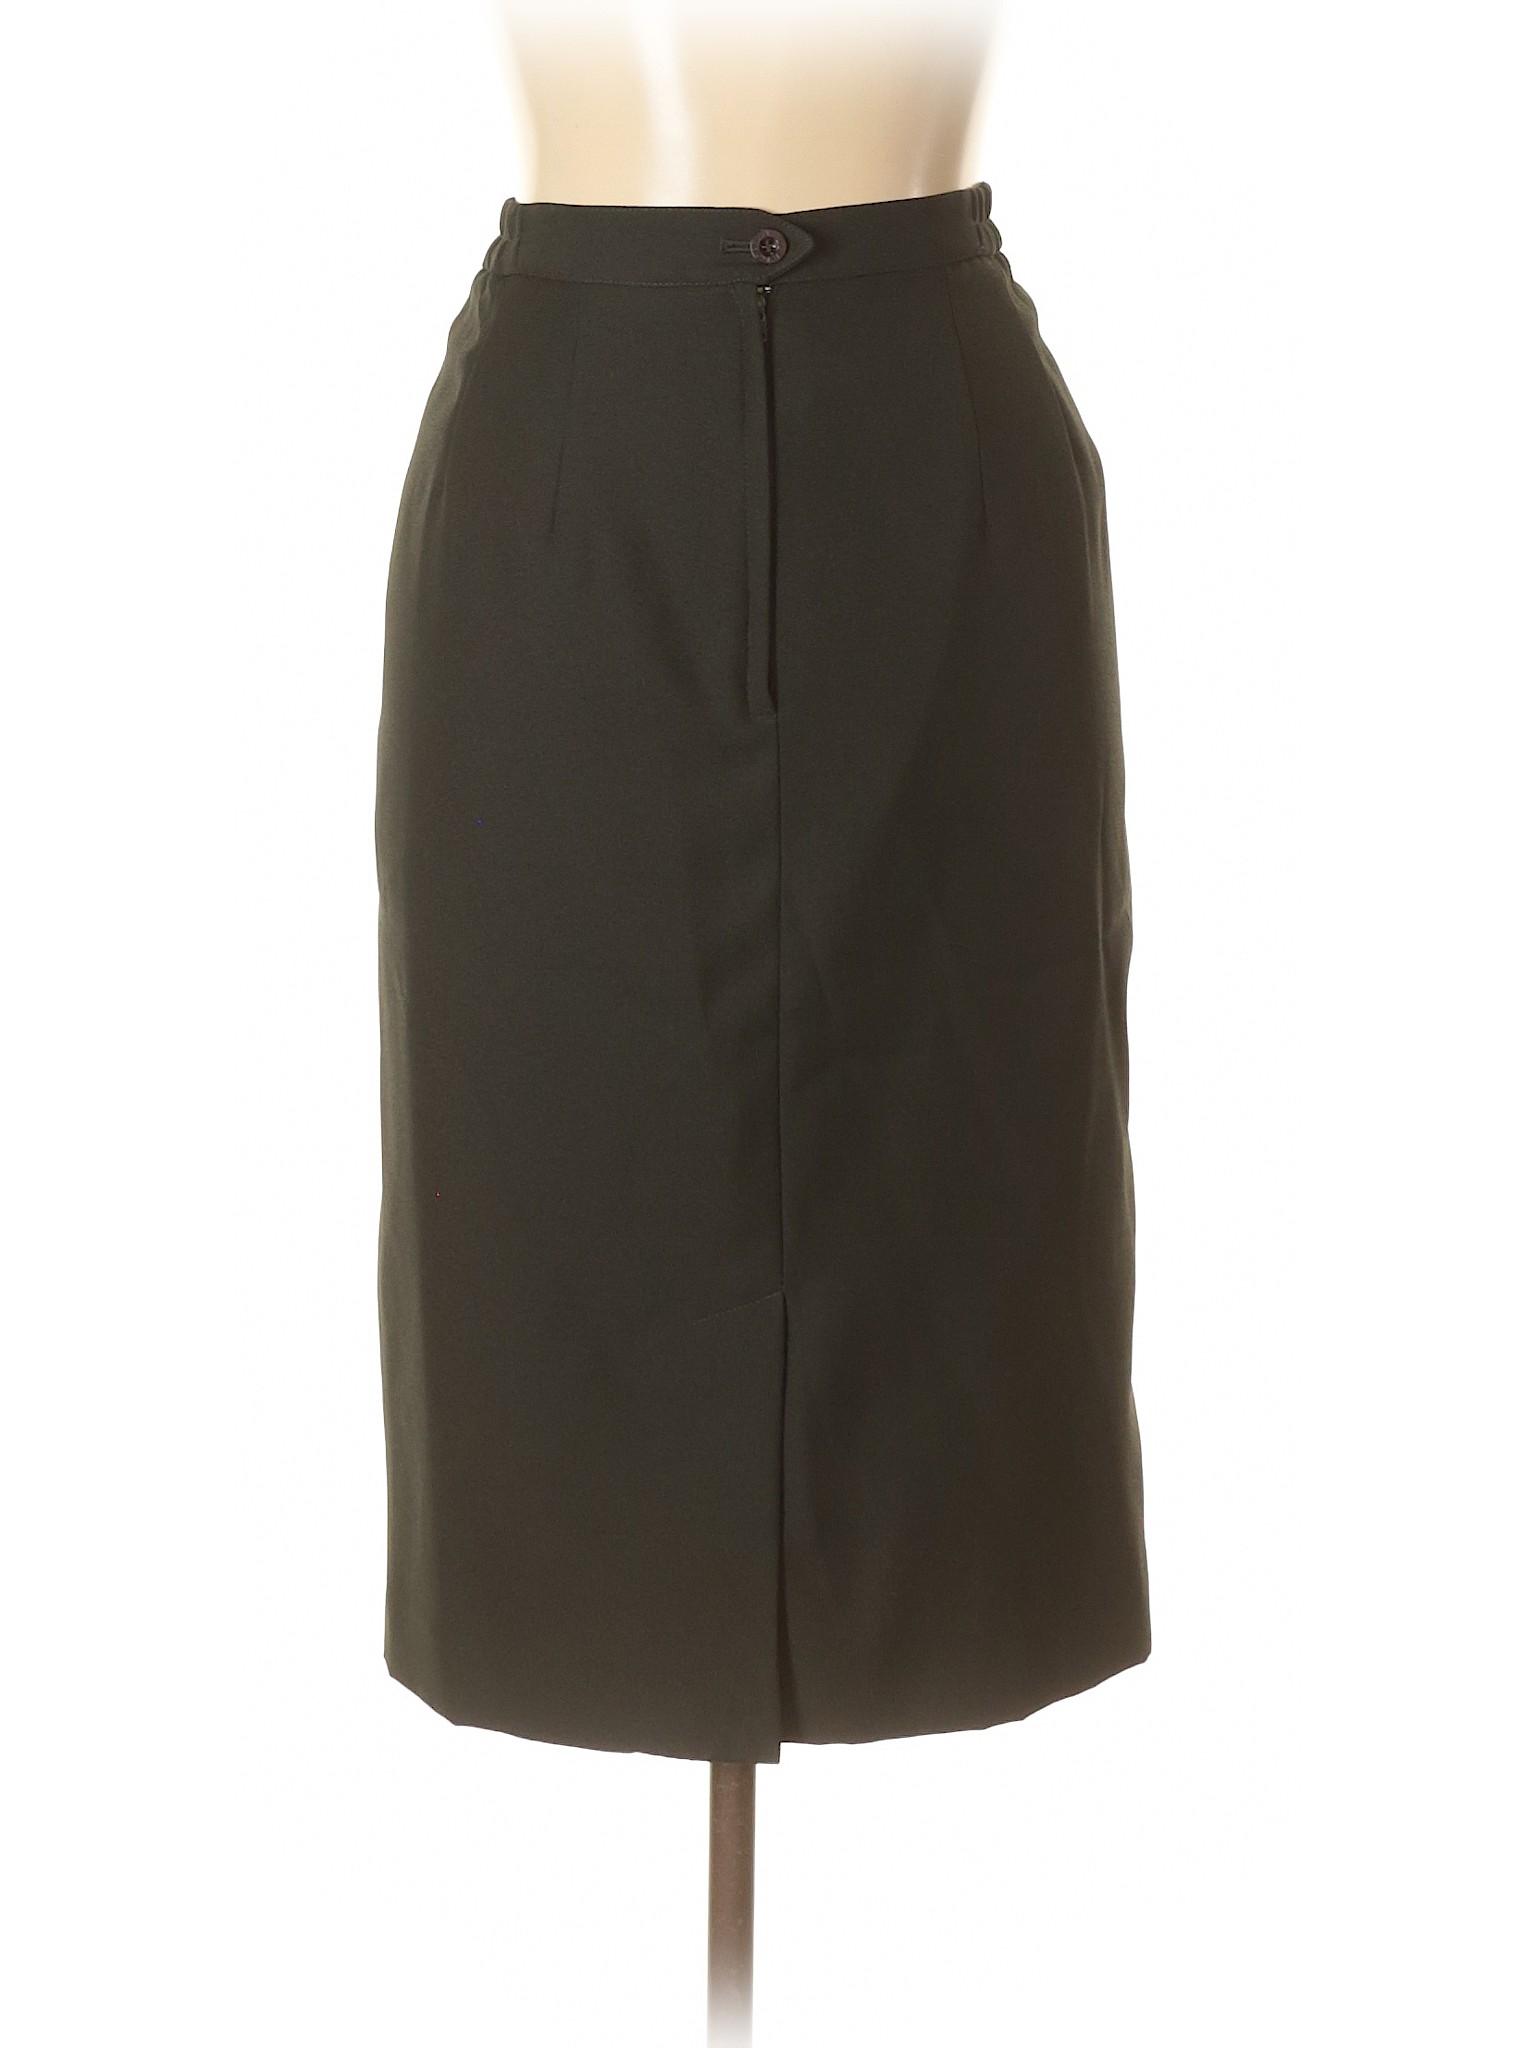 Boutique Skirt Boutique Casual Boutique Skirt Casual Skirt Boutique Casual Pqq8wAtIx